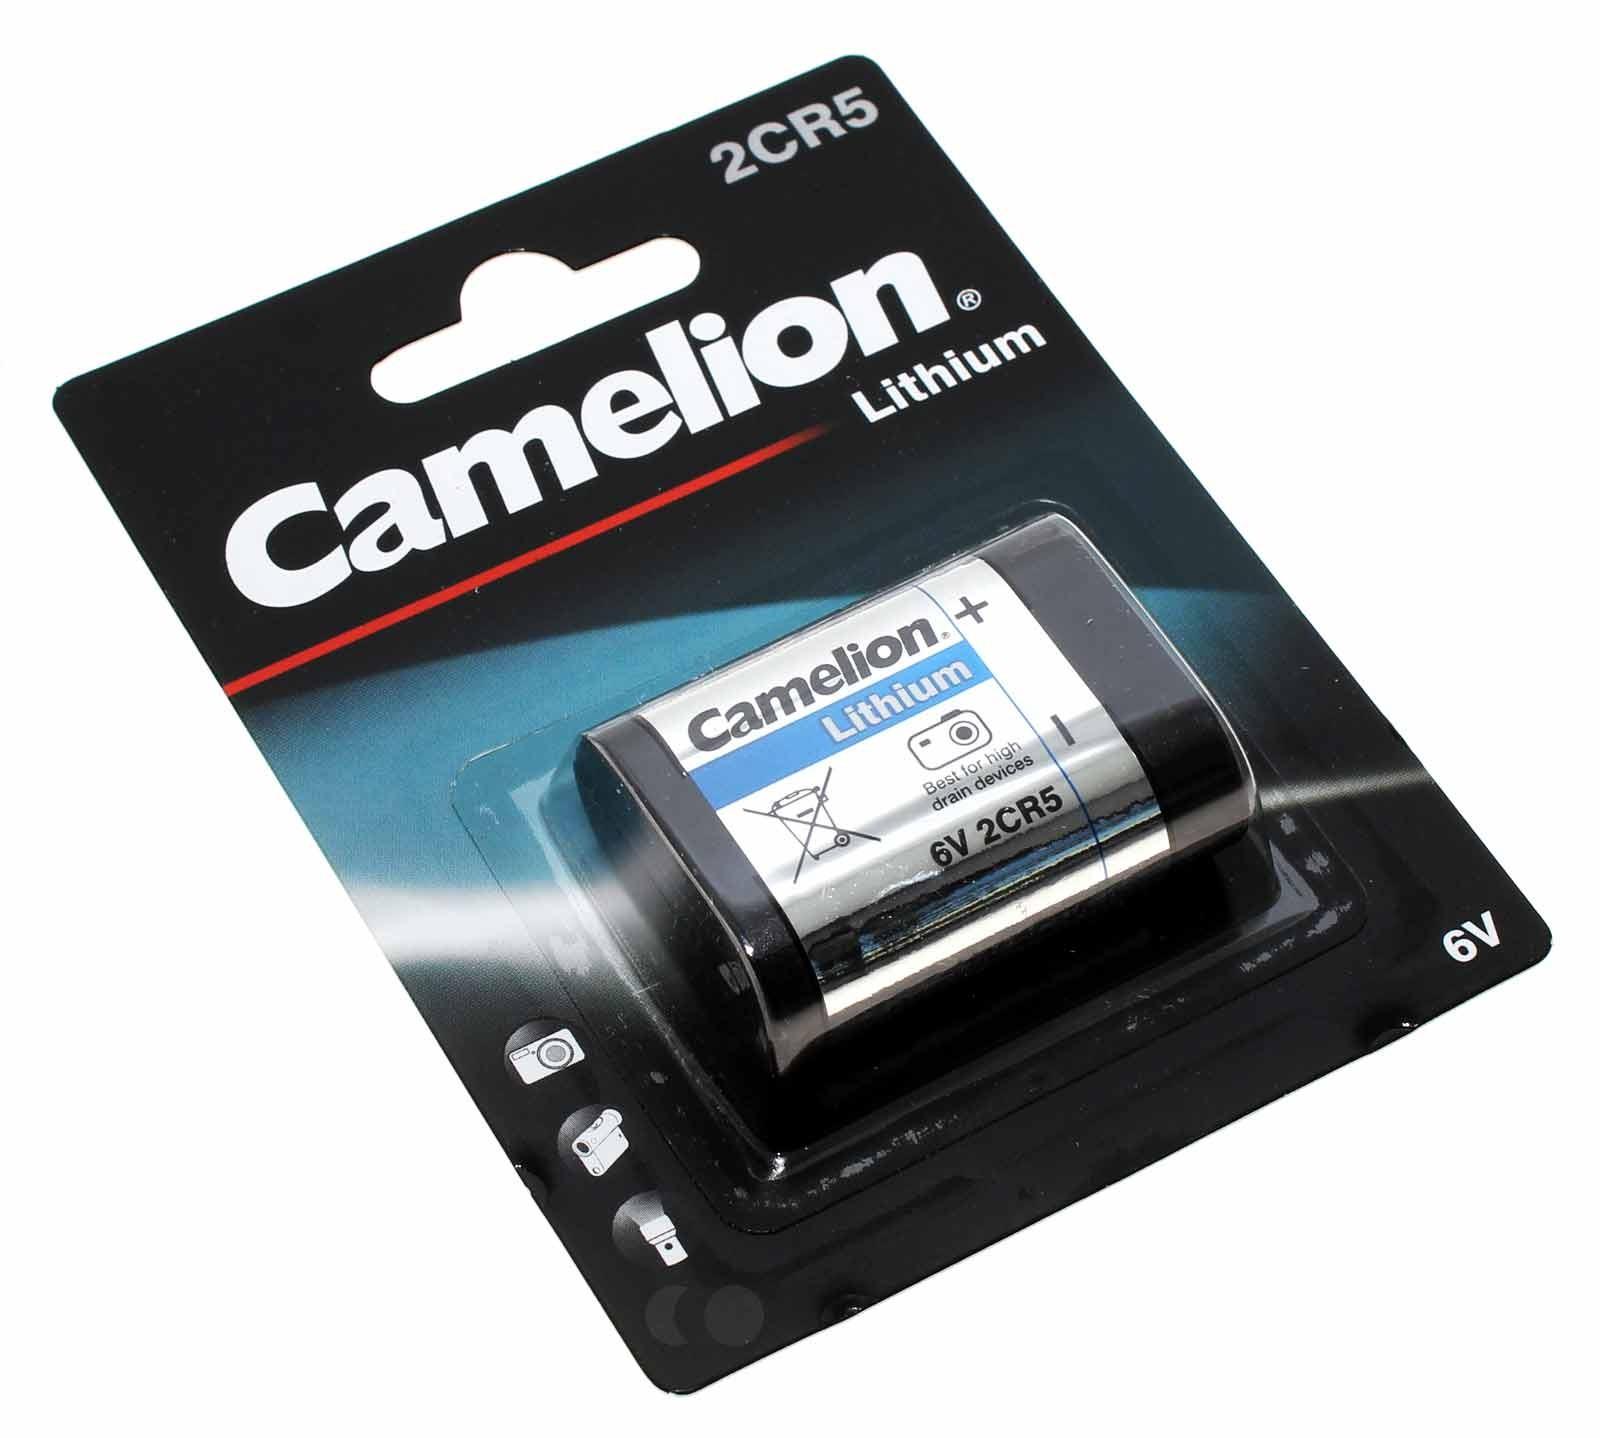 Camelion 2CR5 Lithium Foto Batterie, wie EL2CR5, RL2CR5, DL245, 2CR5M, 5032LC, 245 mit 6V und 1400mAh